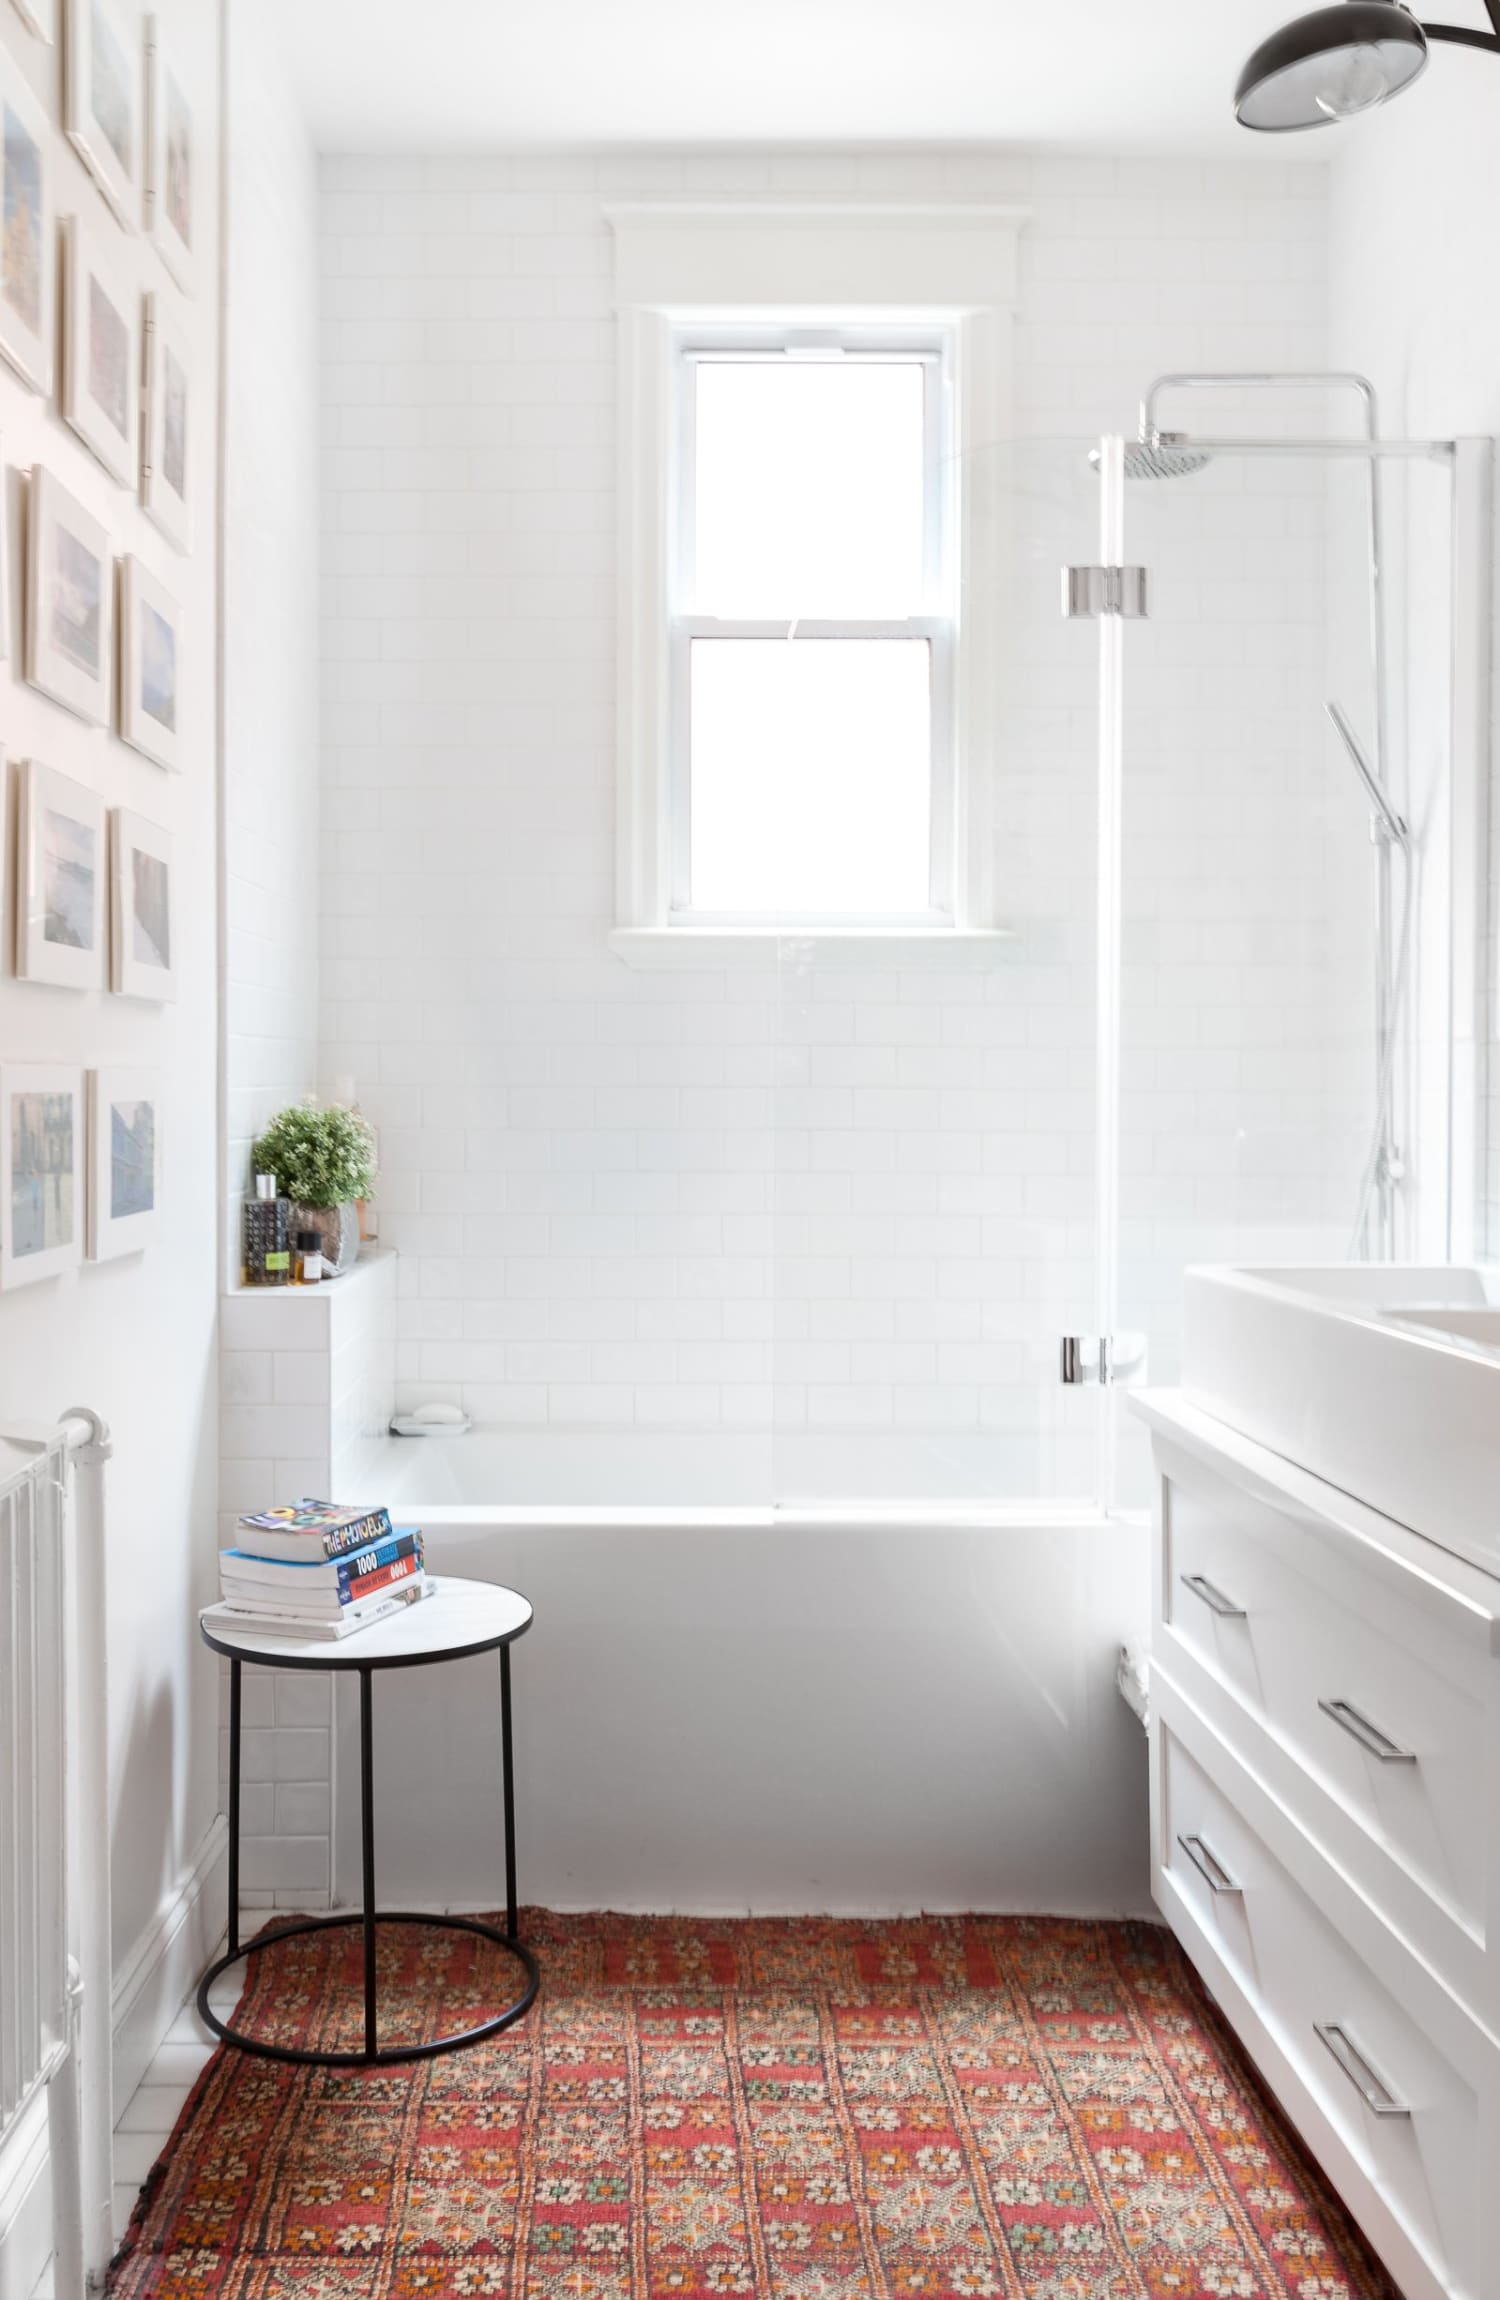 Small Bathroom Design Ideas - 7 Beautiful Remodels ... on Apartment Bathroom  id=95635